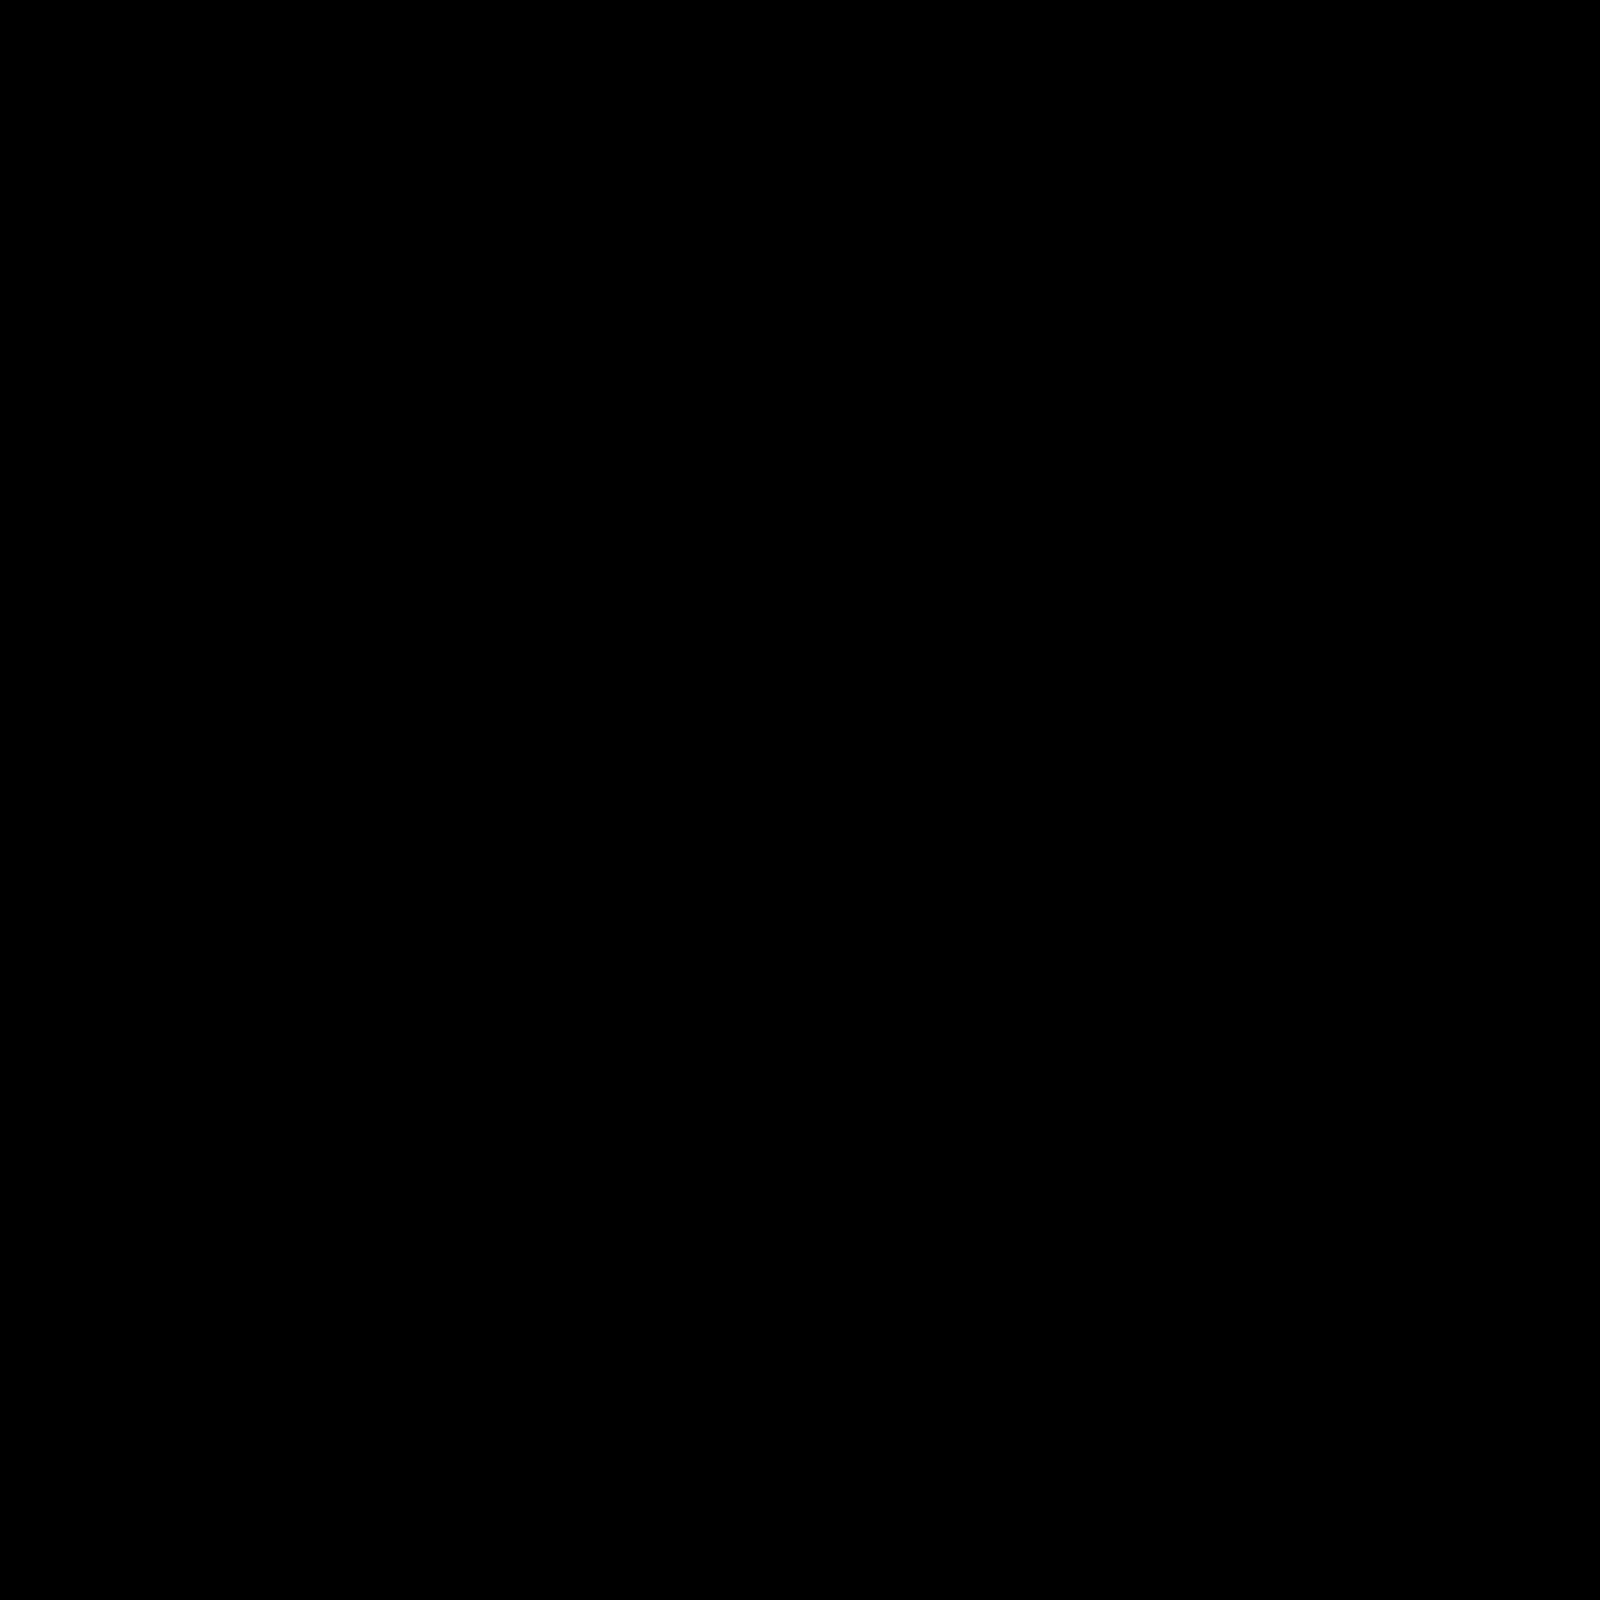 りんご icon. The icon is a picture of an apple. The icon has a stem on the top with a leaf coming out of the right side of the stem. The apple would appear to be cut in half, as there are what appears to be two seeds in the middle of the icon.